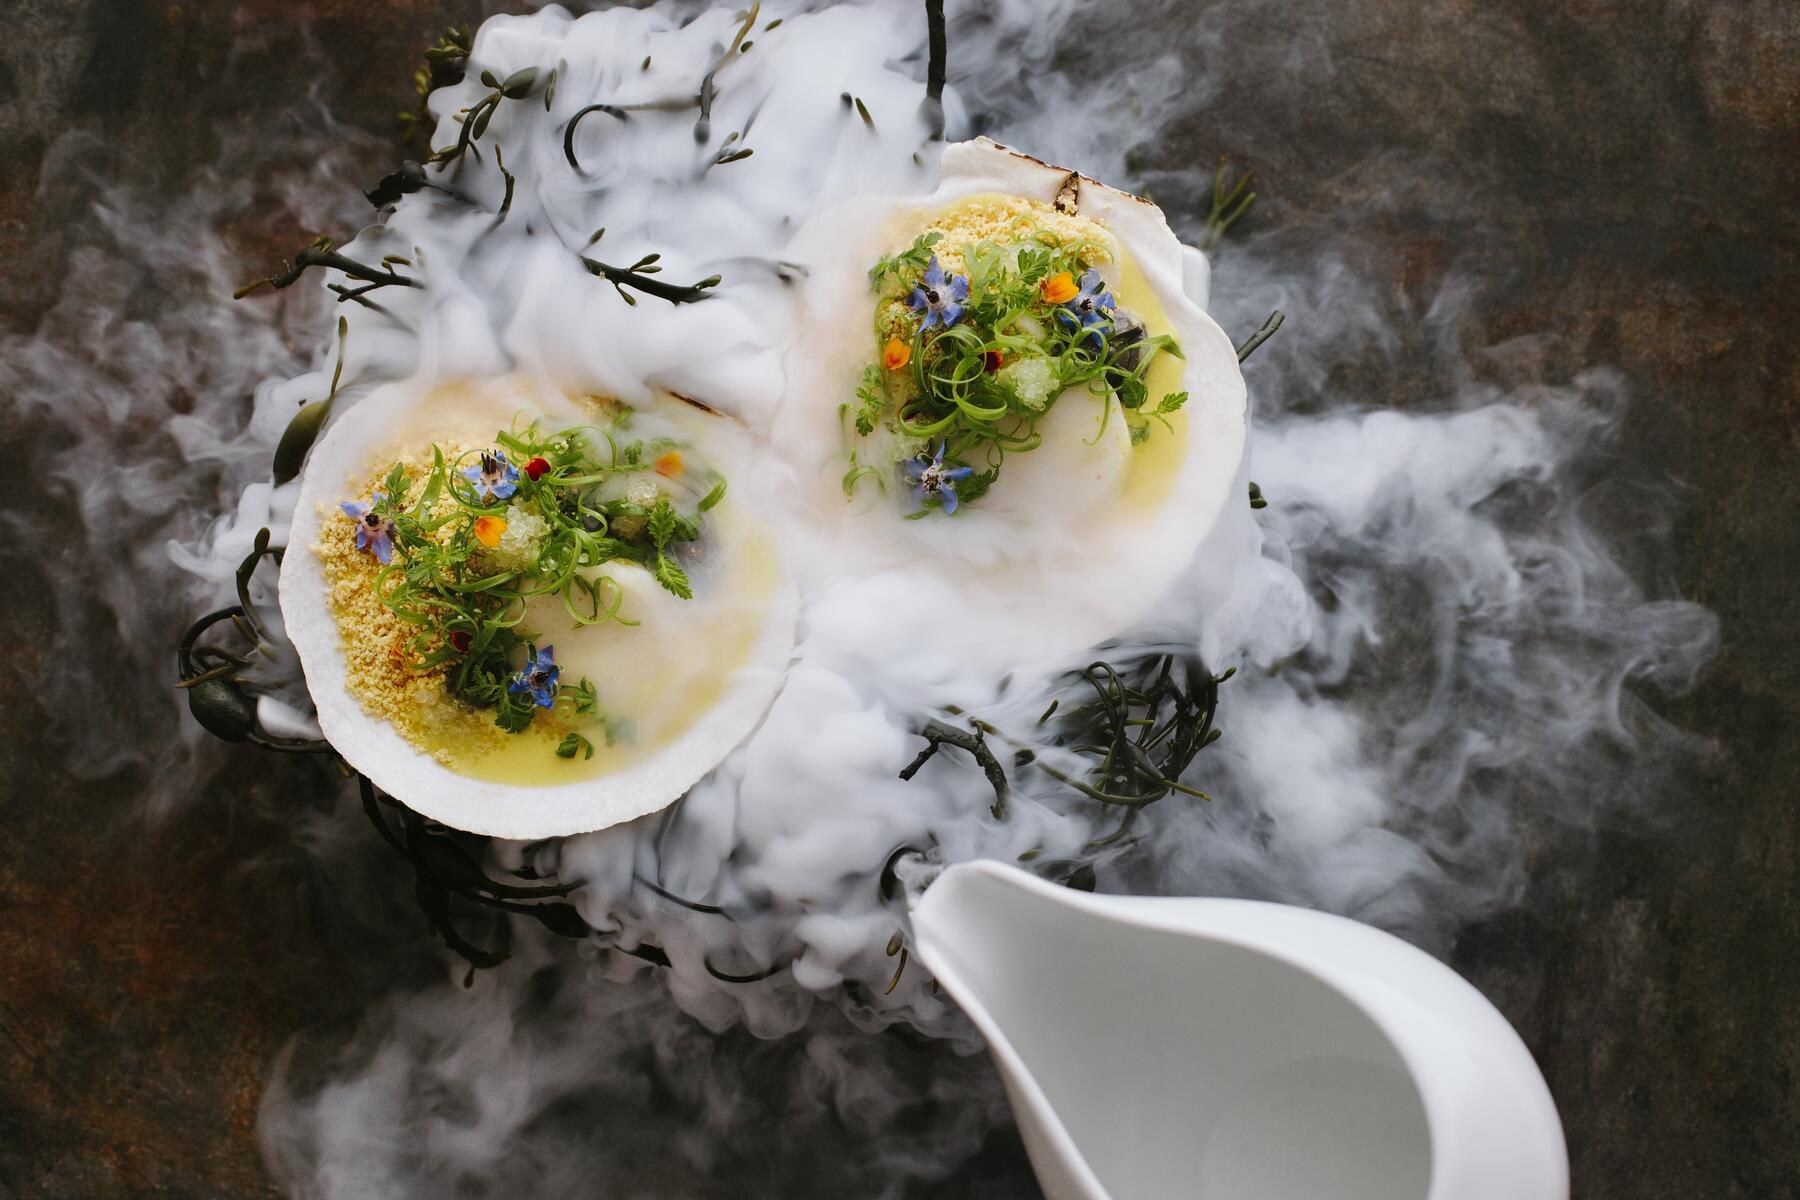 Platters of scallops